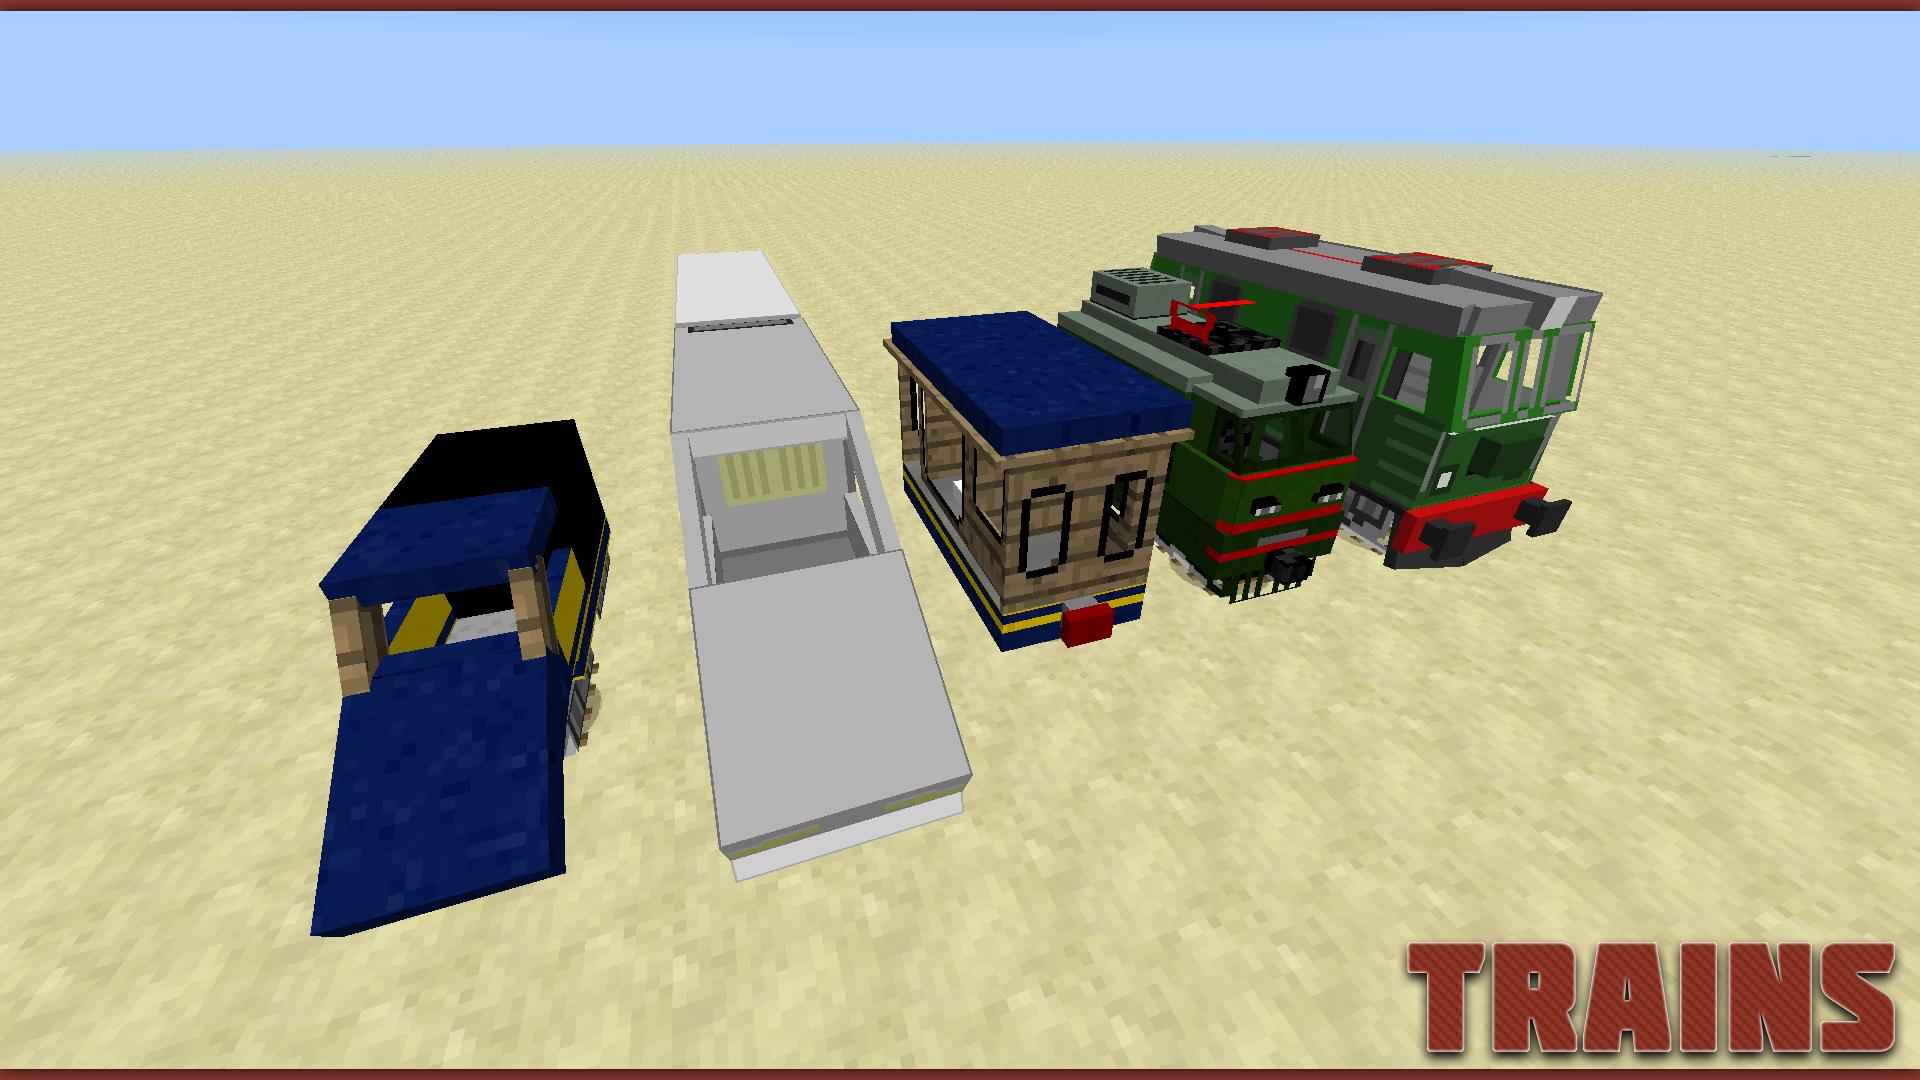 Trains1